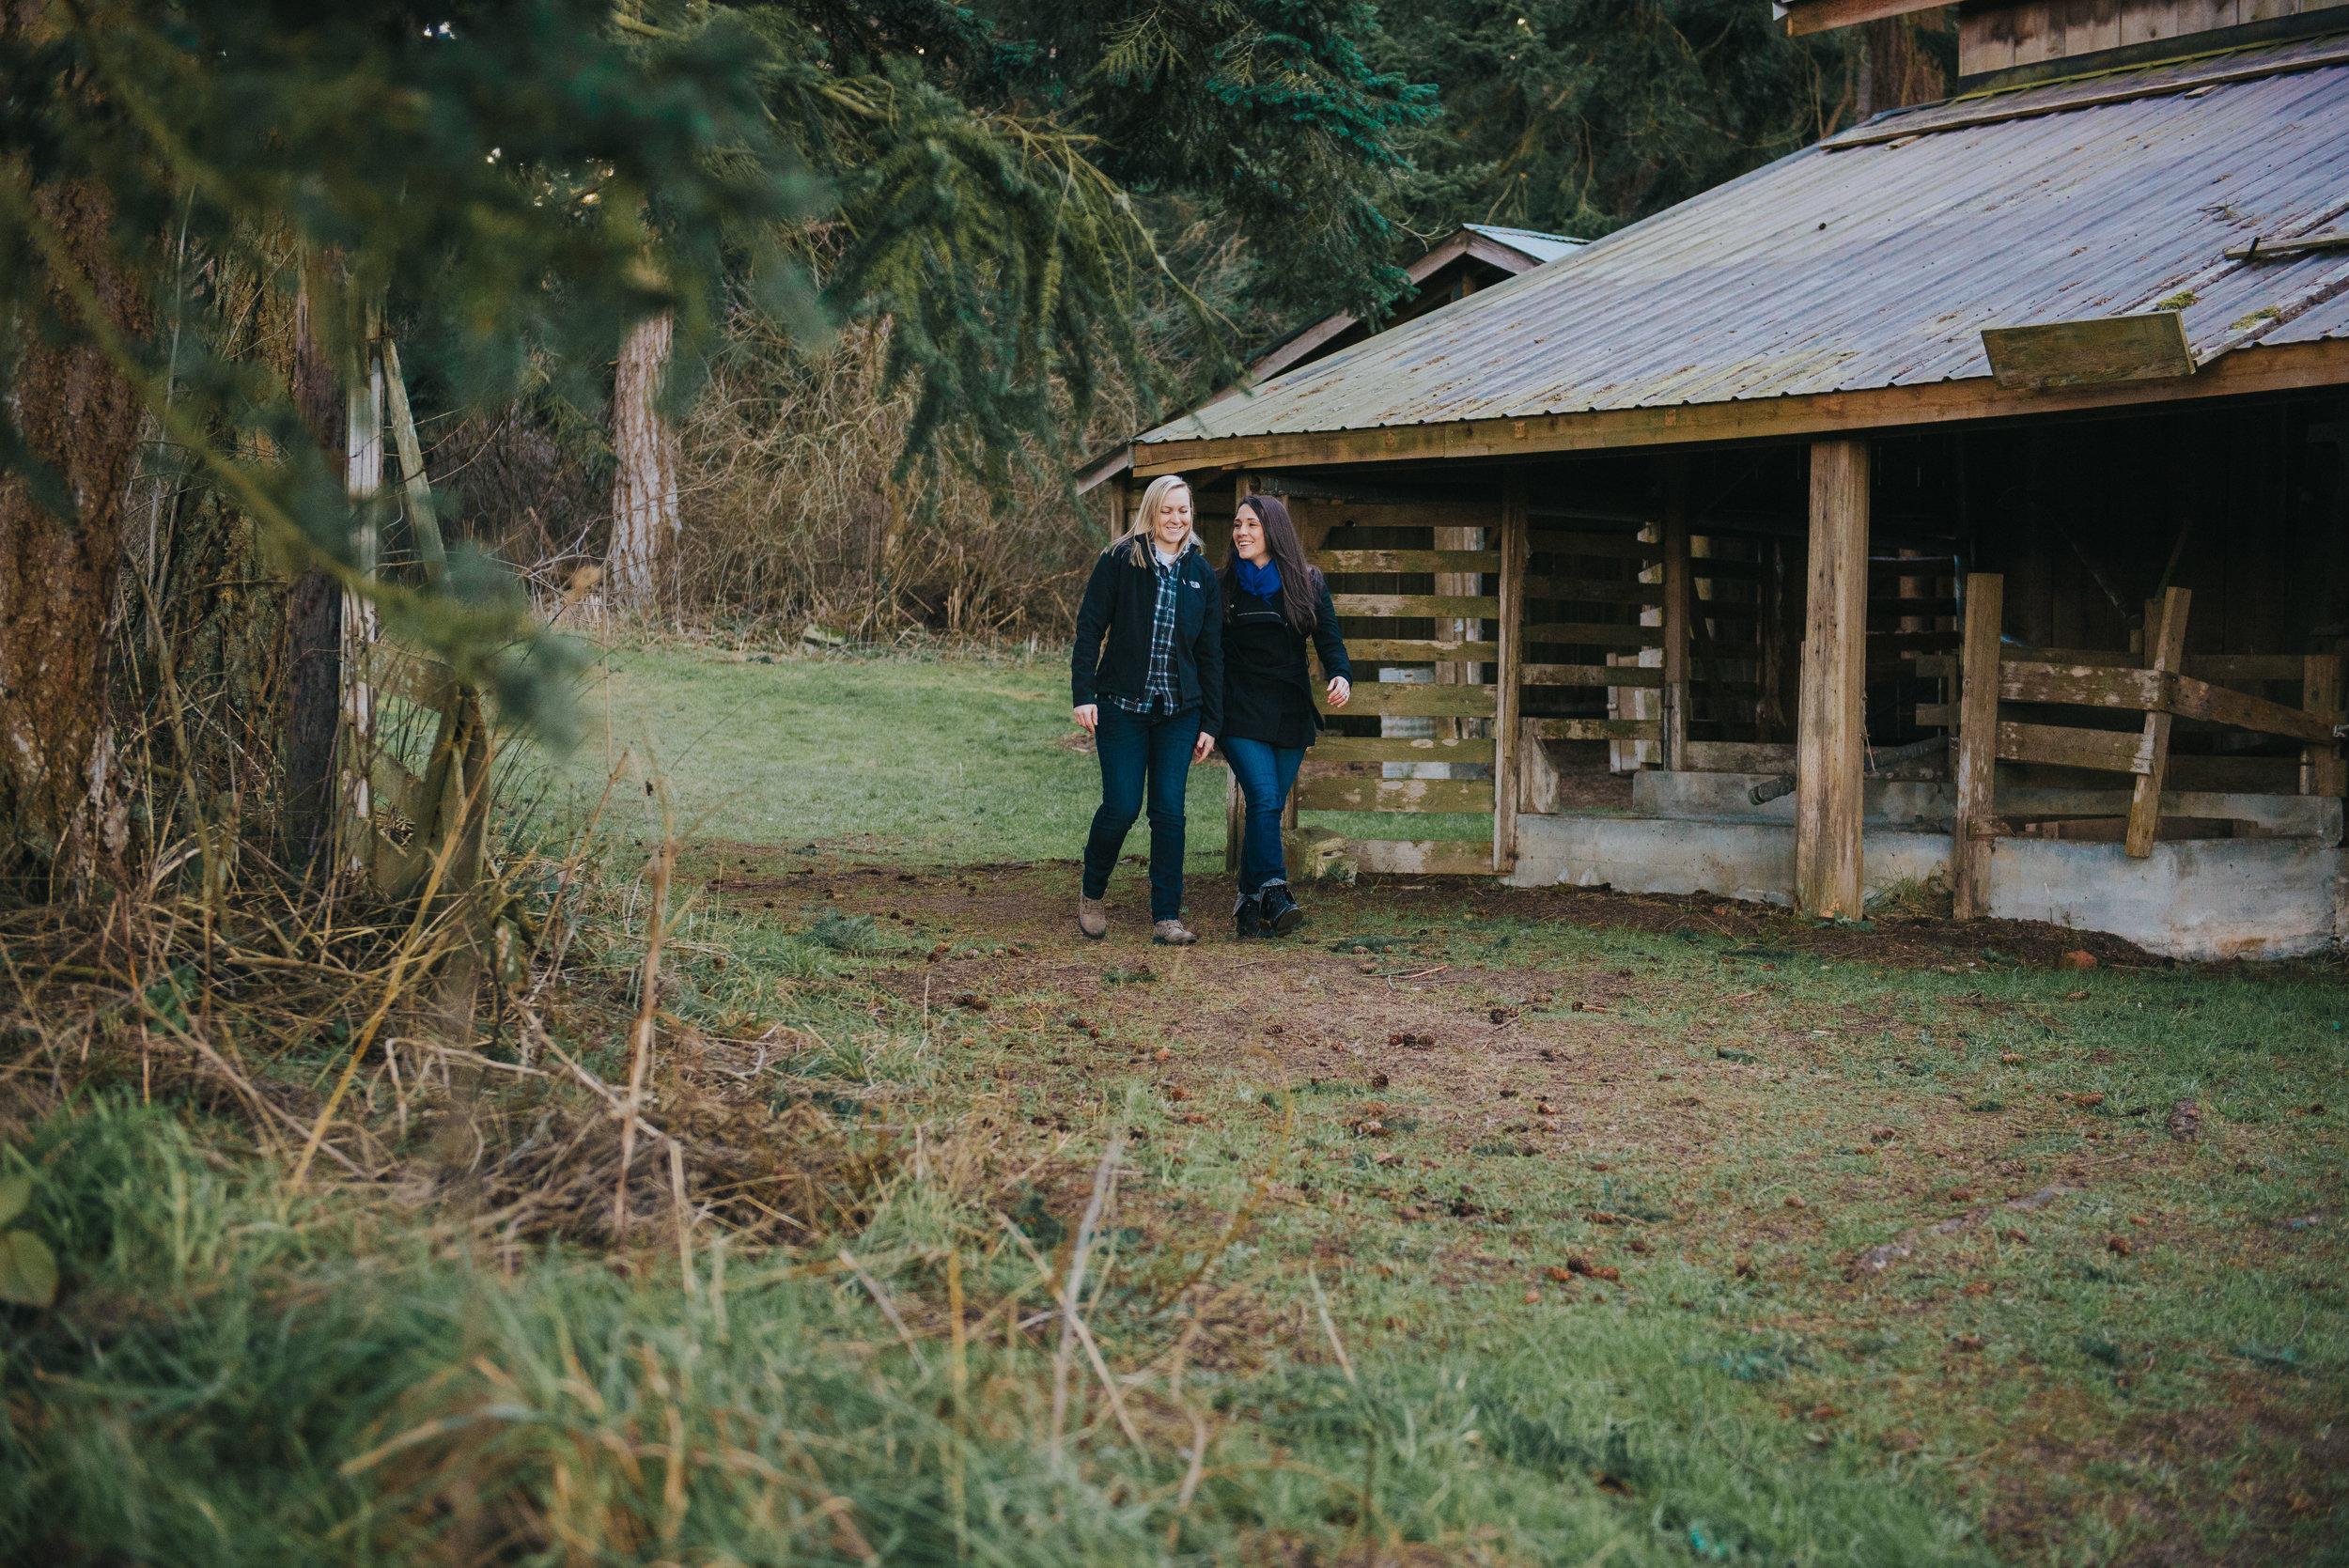 Oak-Harbor-Wedding-Photographer-J-Hodges-Photography (10 of 32).jpg